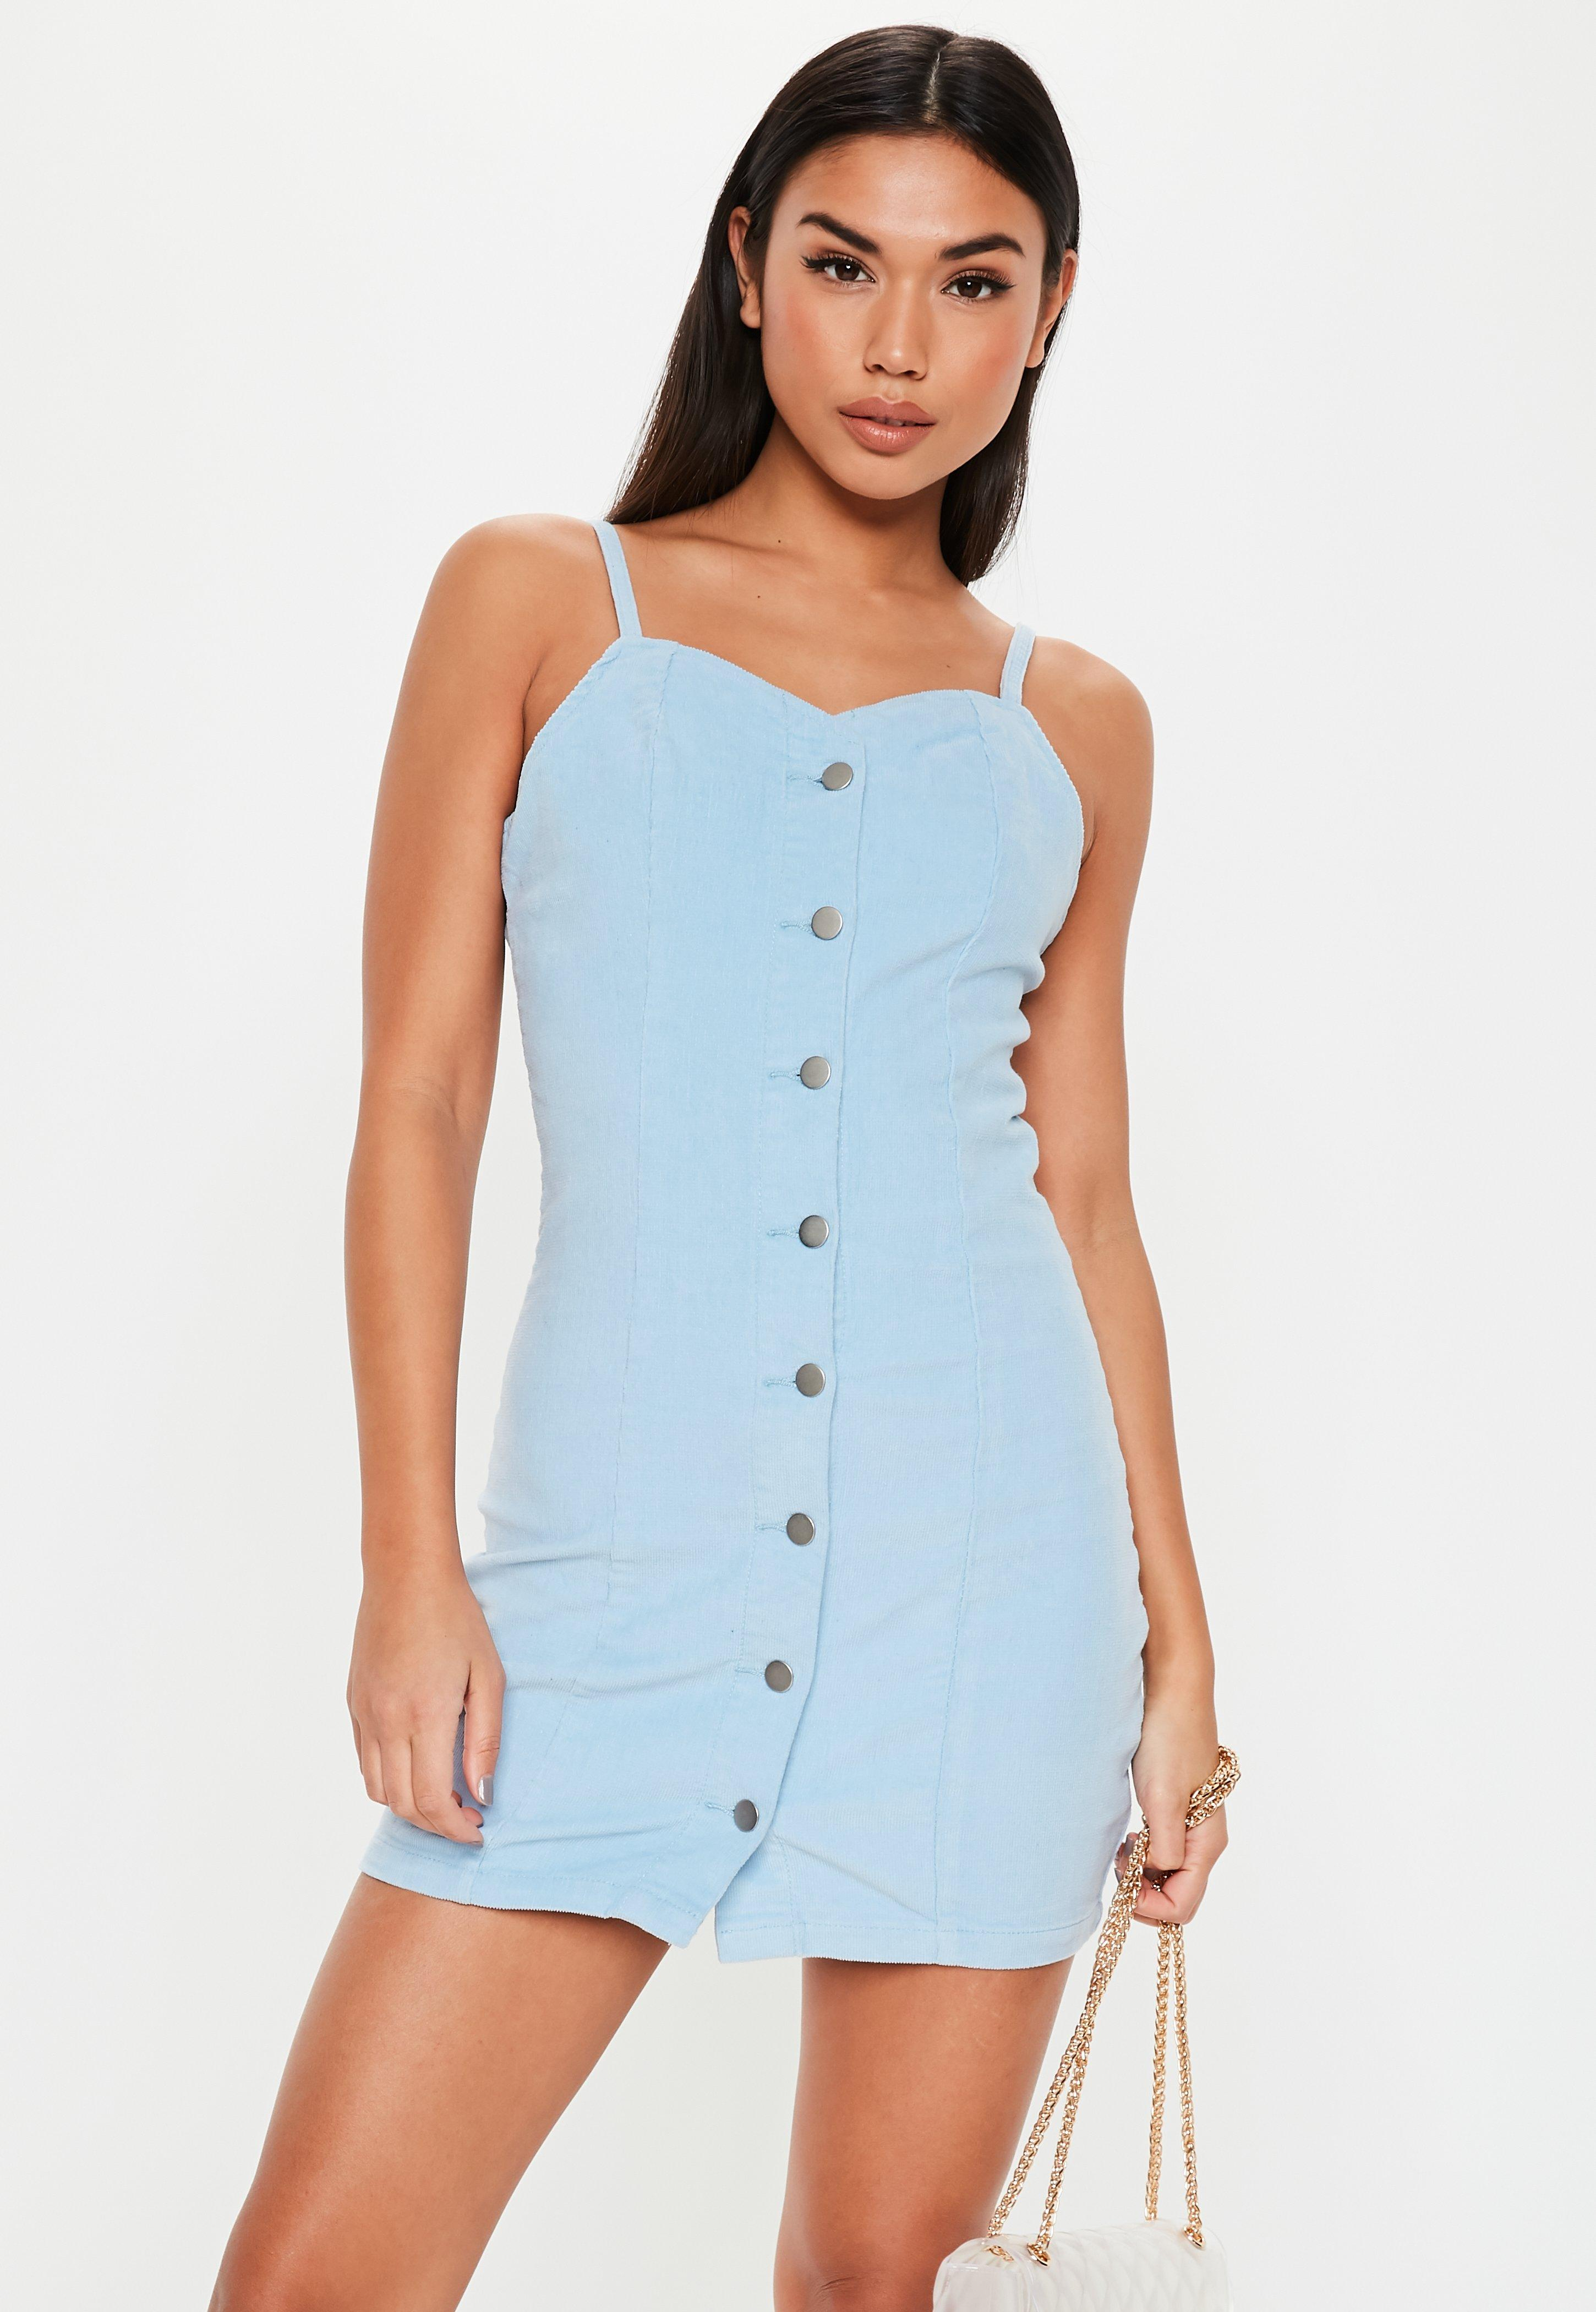 74496d36 Niebieska sztruksowa sukienka zapinana na guziki